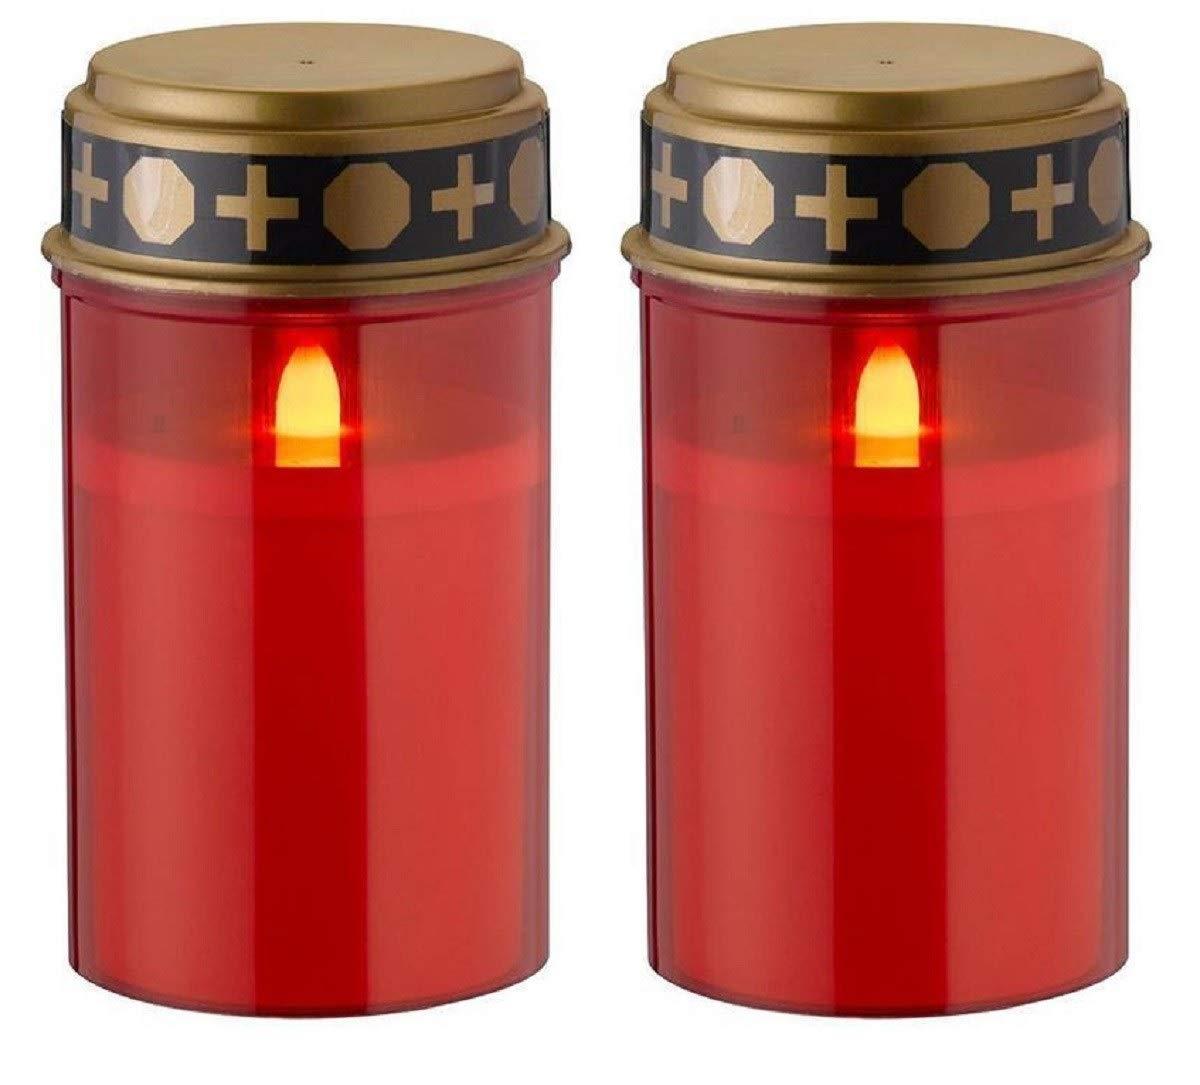 WOFI Grablicht; NACO; Rot; 1 x LED 0,06 Watt 845901190000